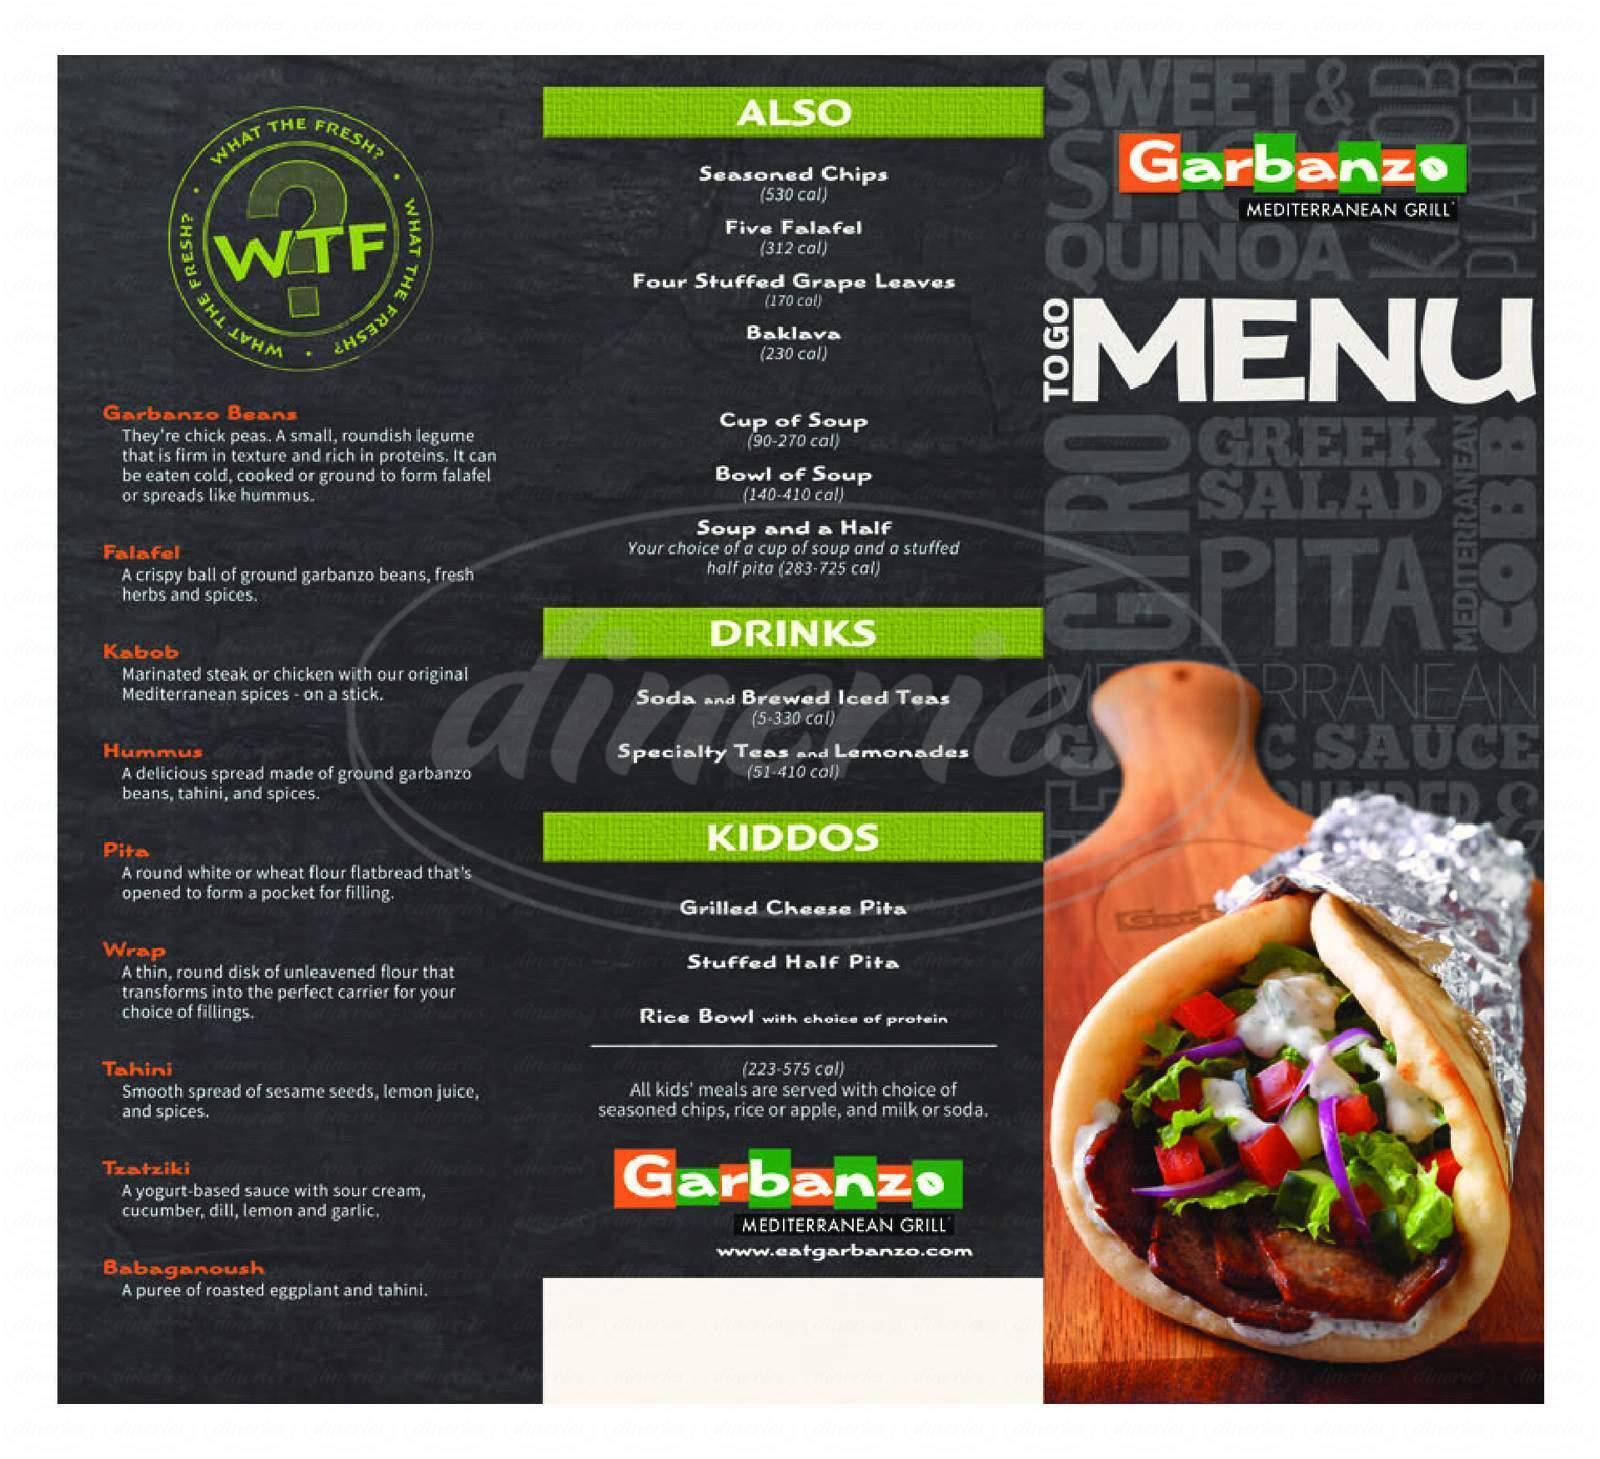 menu for Garbanzo Mediterranean Grill